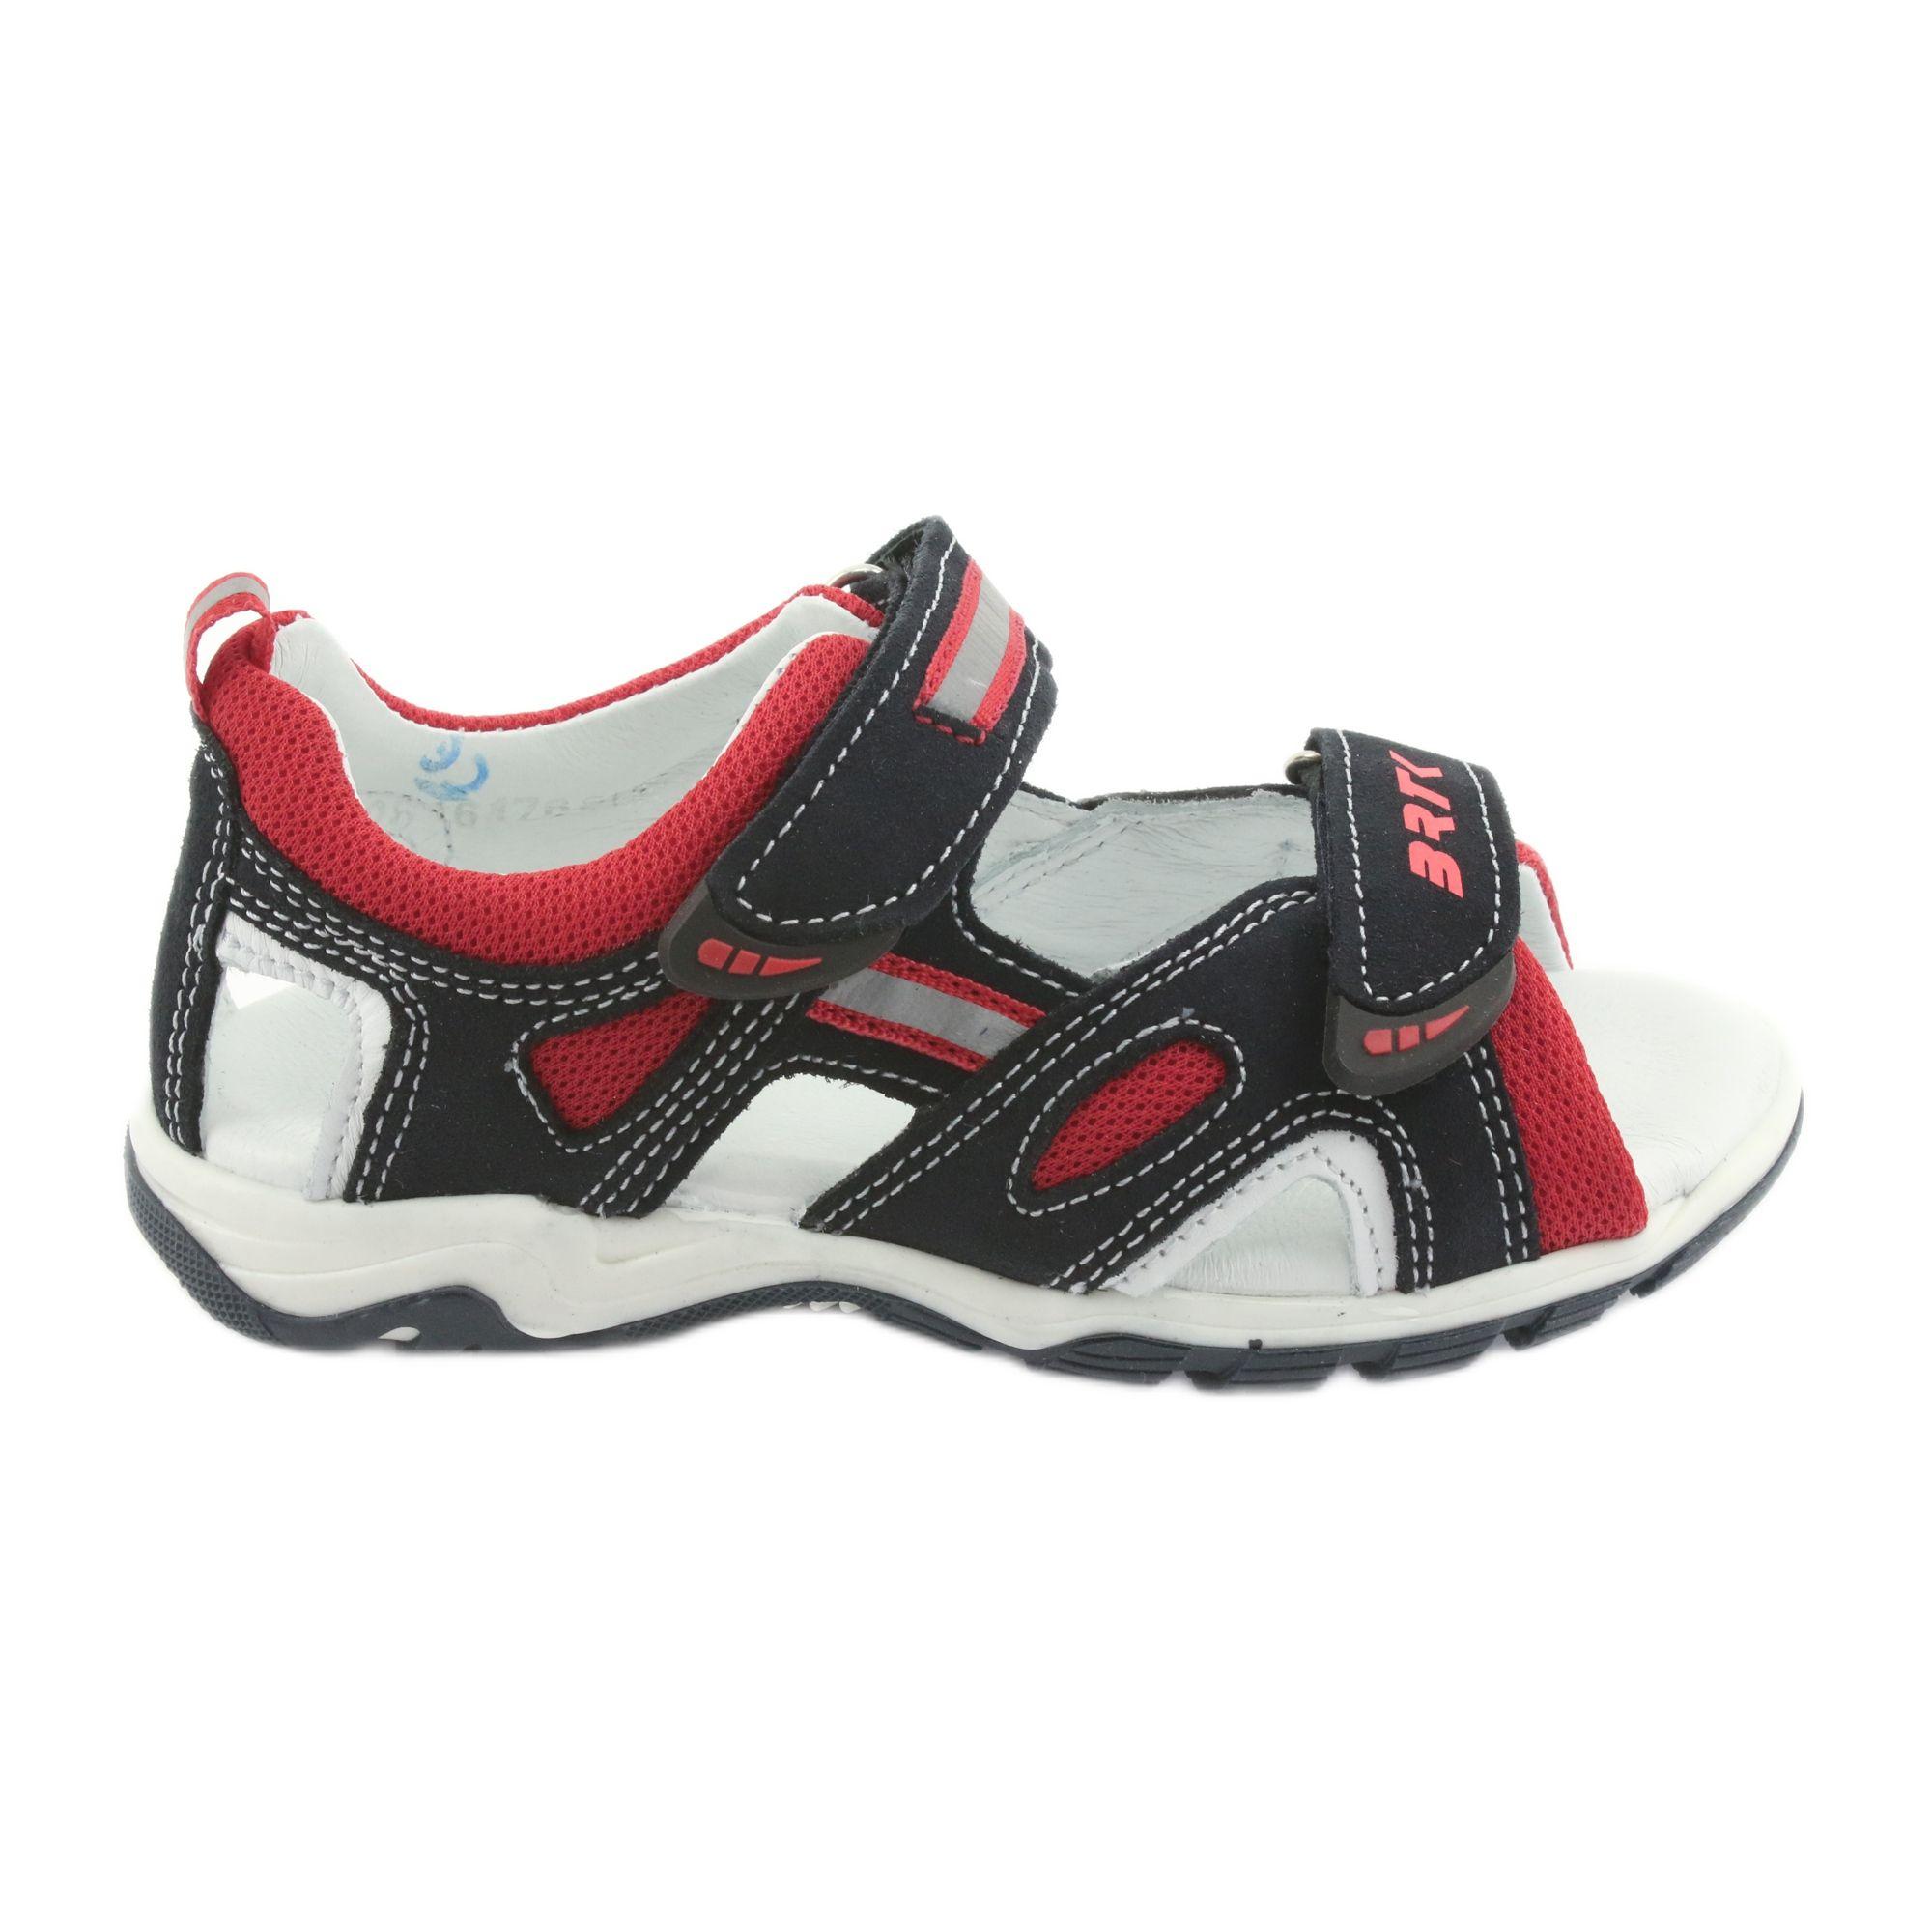 Sandalki Chlopiece Rzepy Bartek 16176 Granatowo Czerwone Szare Granatowe Stylish Sandals Kid Shoes Boys Sandals